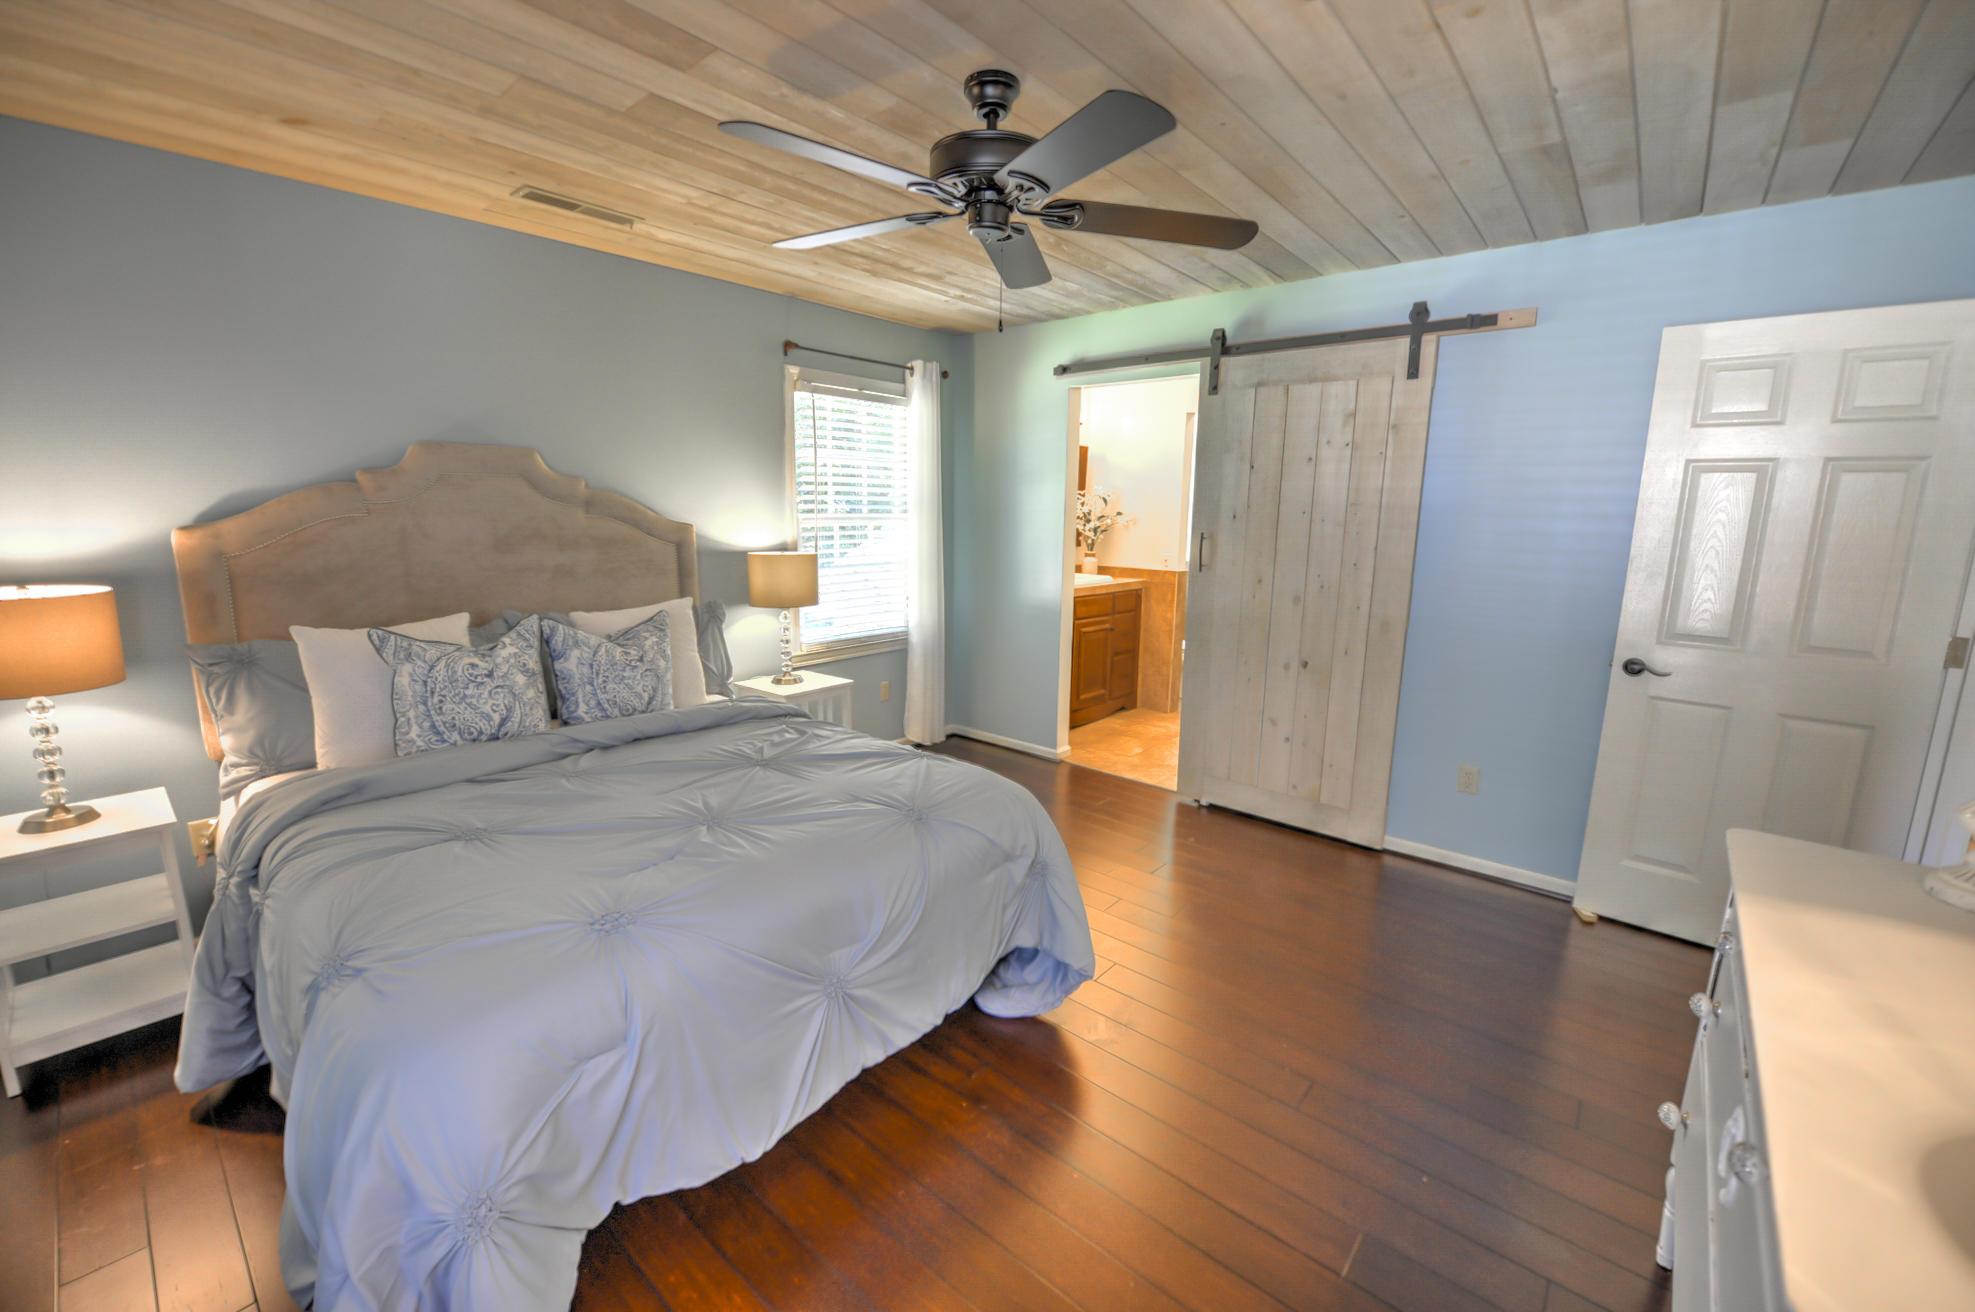 Shemwood II Homes For Sale - 1017 Jack Snipe, Mount Pleasant, SC - 5